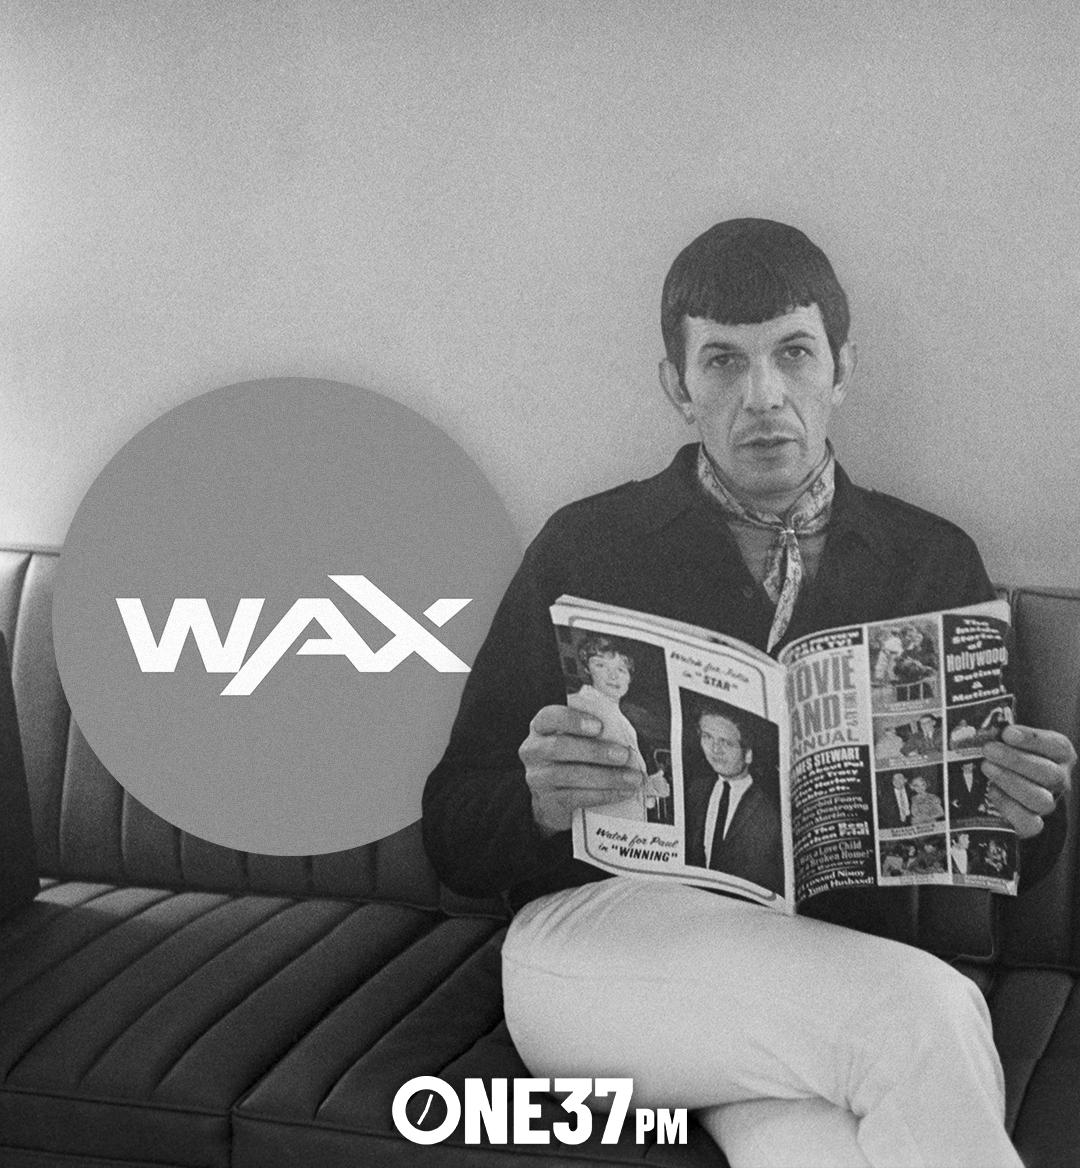 WAX MOBILE